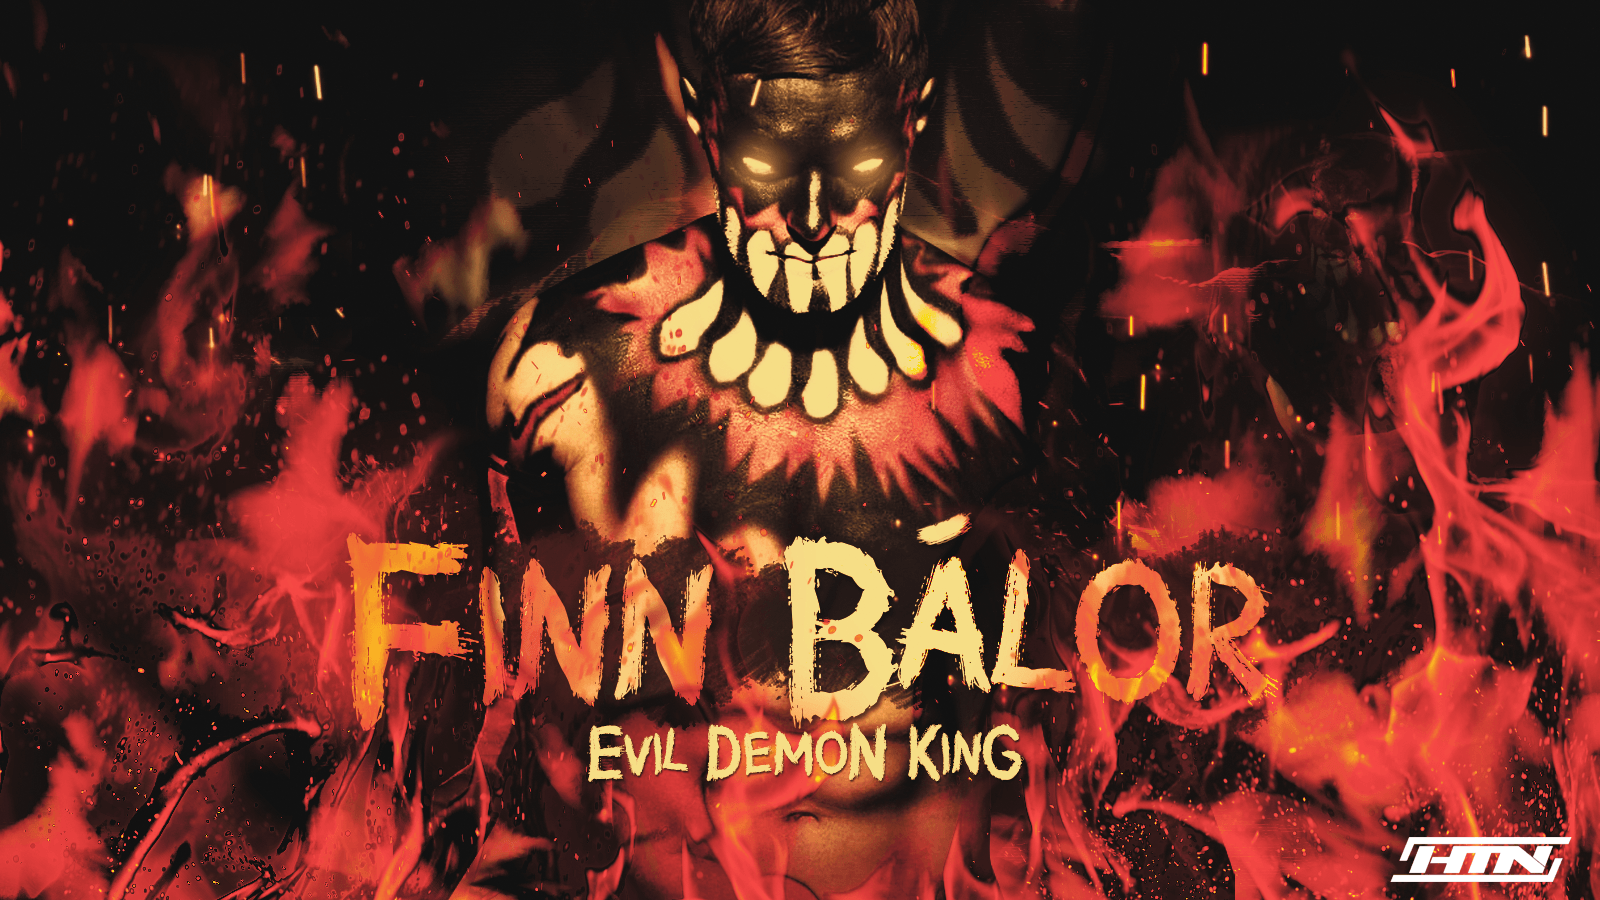 finn balor wallpaper - photo #1